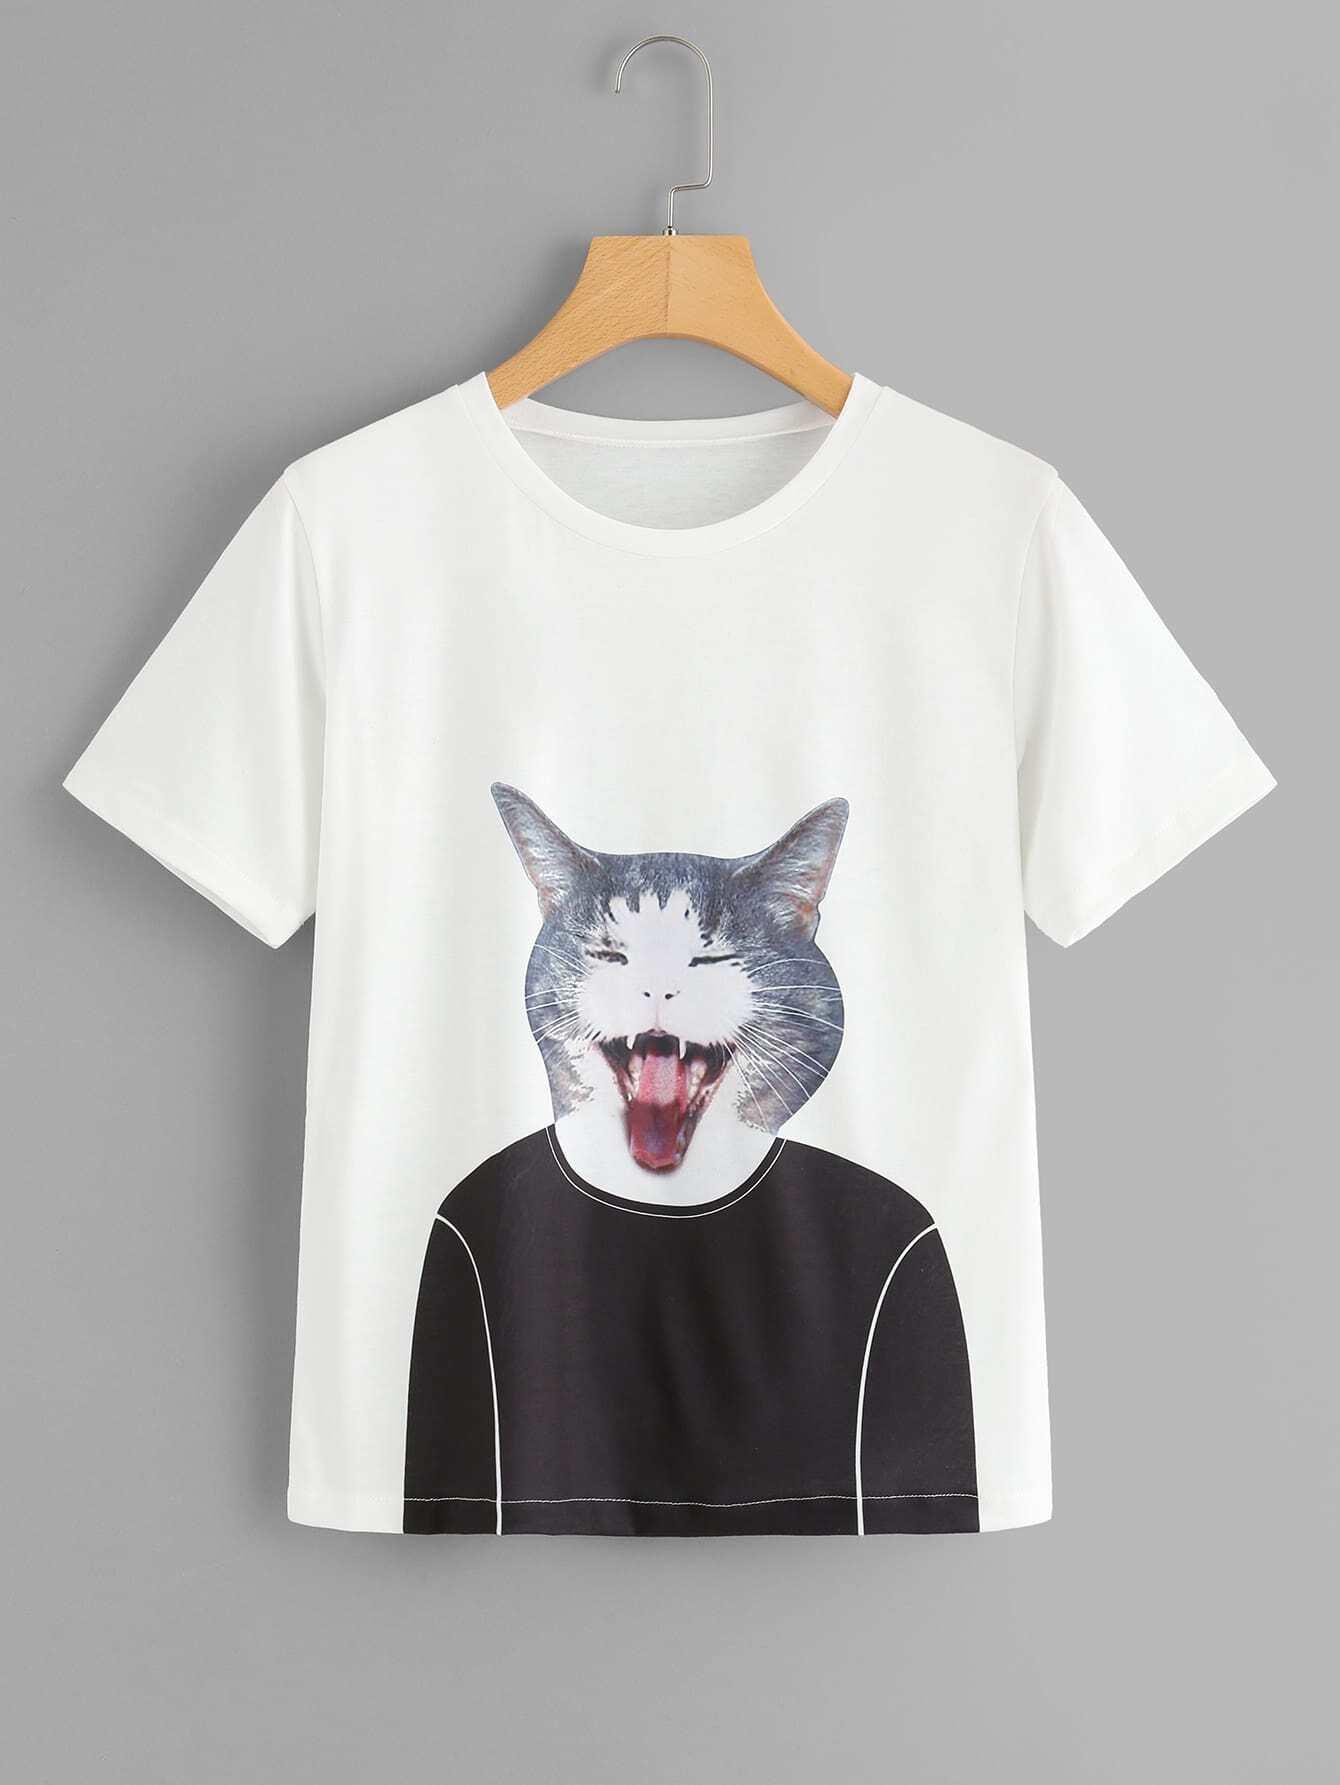 Cat Print Short Sleeve Tee sailing ship print short sleeve tee